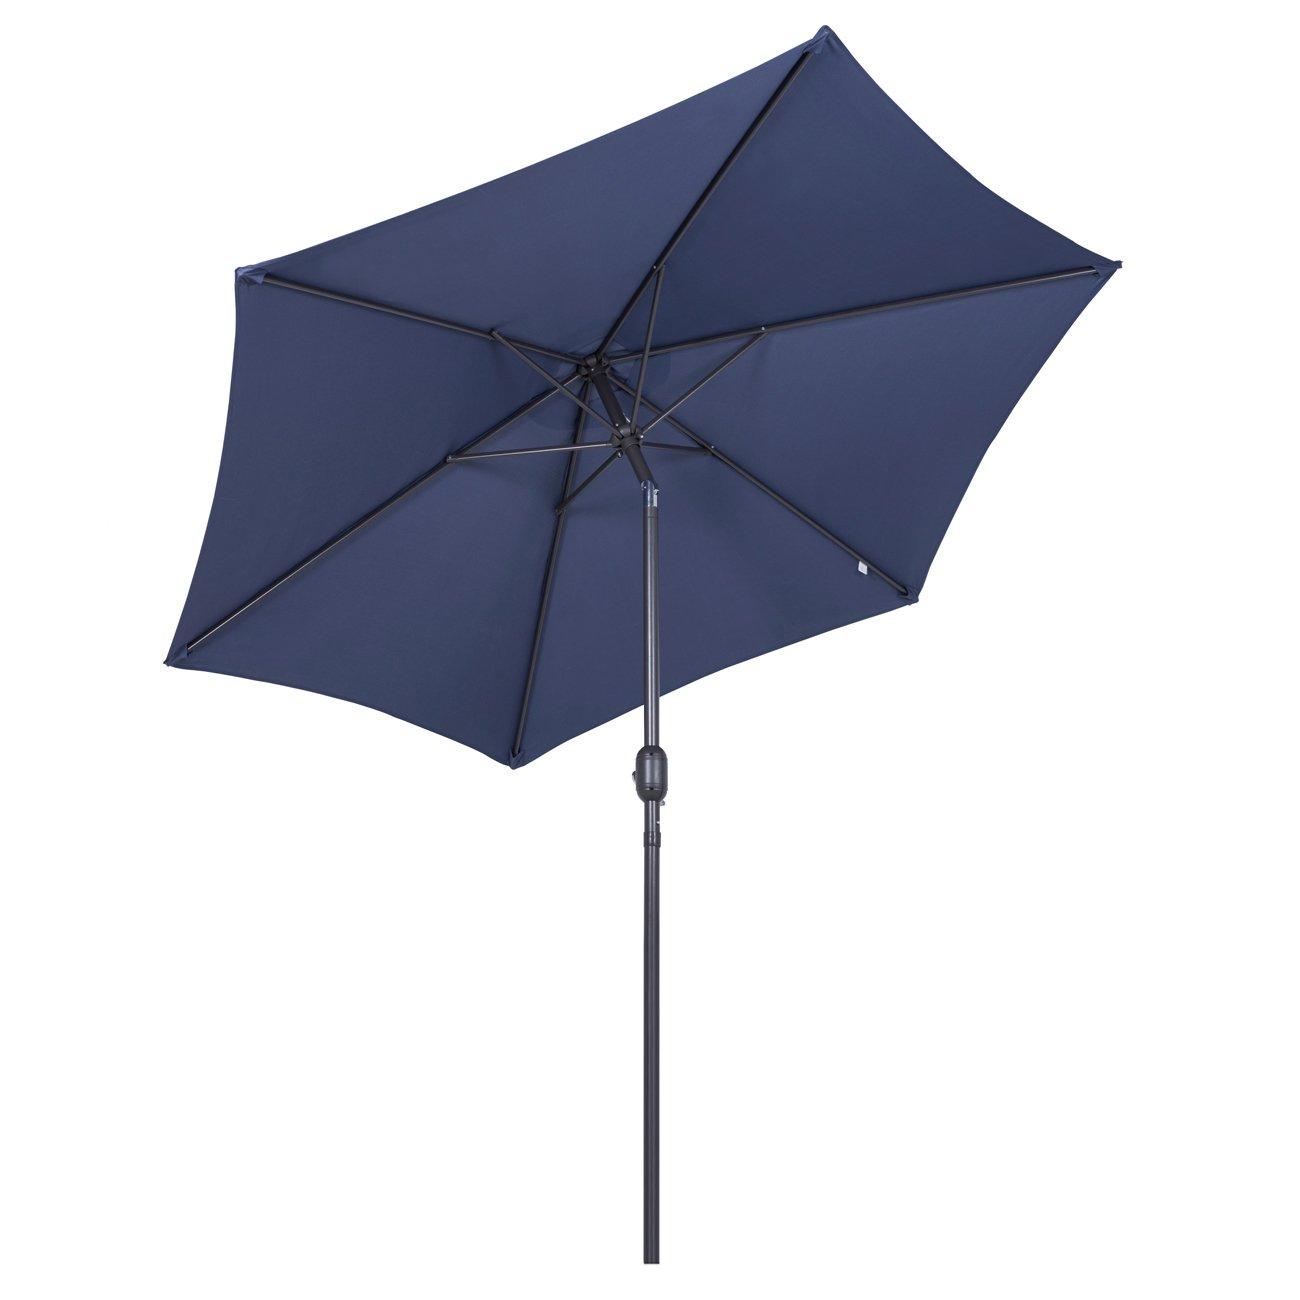 Crema Sekey/® sombrilla Parasol para terraza jard/ín Playa Piscina Patio di/ámetro 270 cm Protector Solar UV50